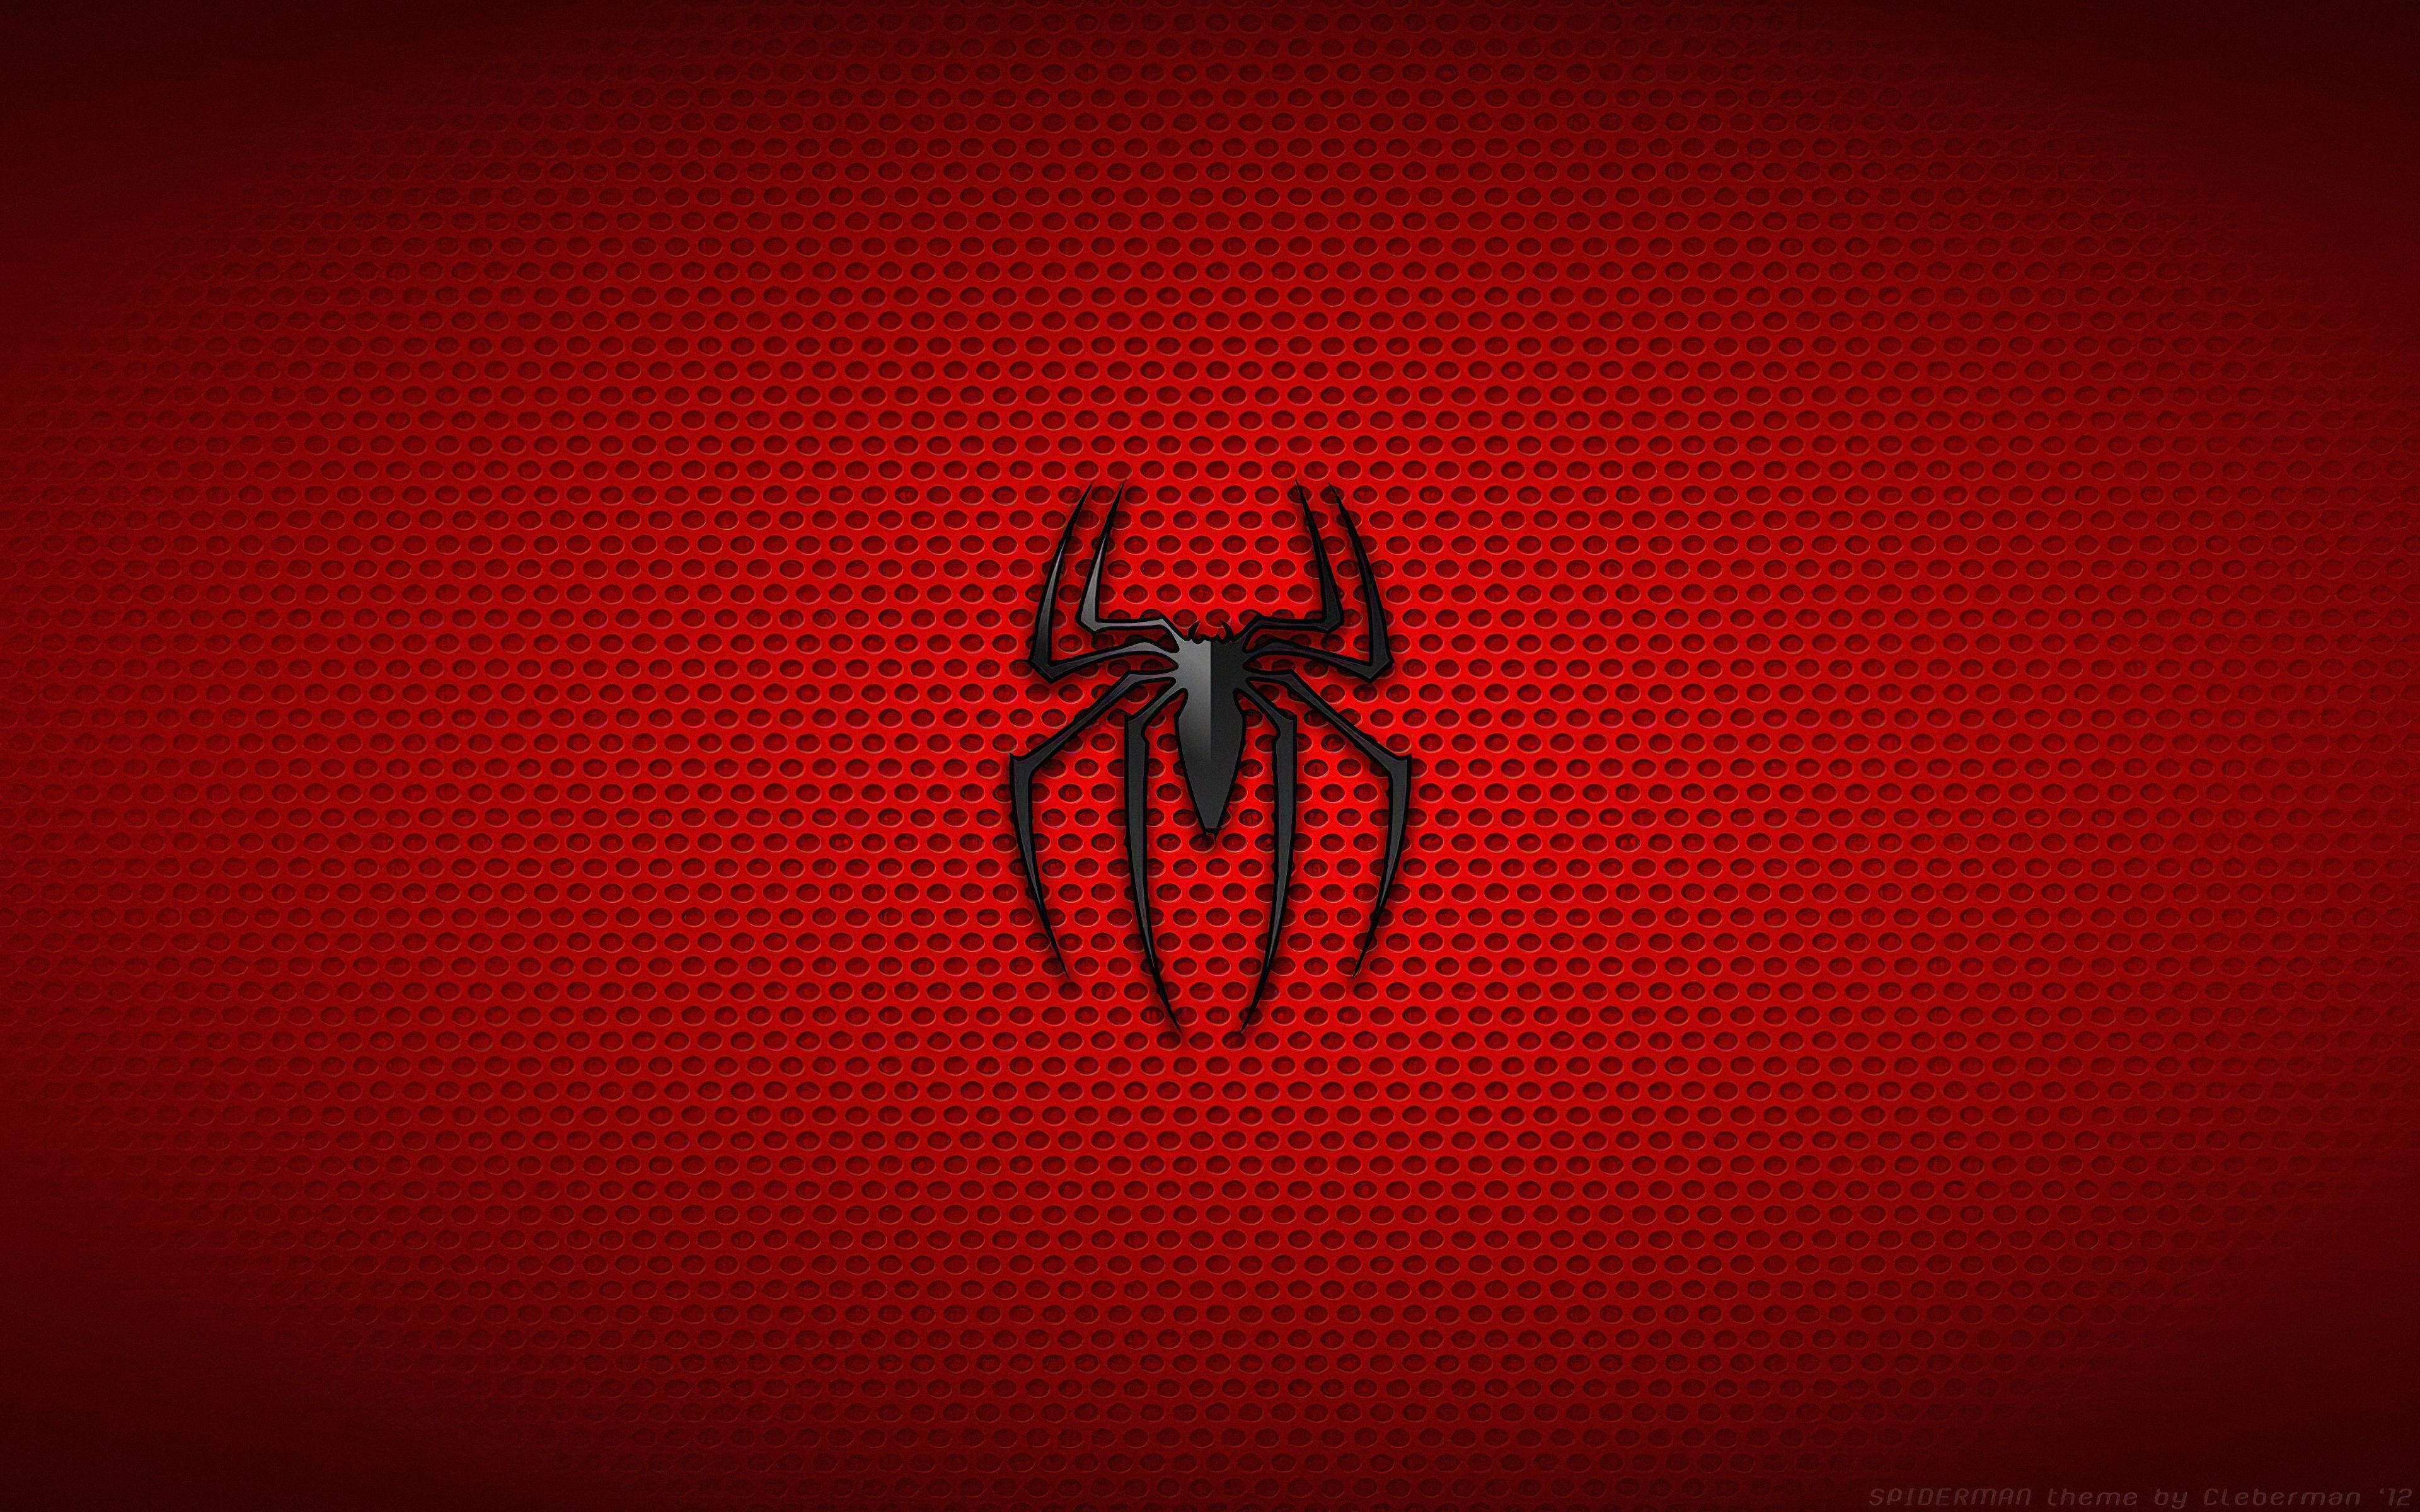 Spiderman Symbol Wallpapers - Top Free Spiderman Symbol ...